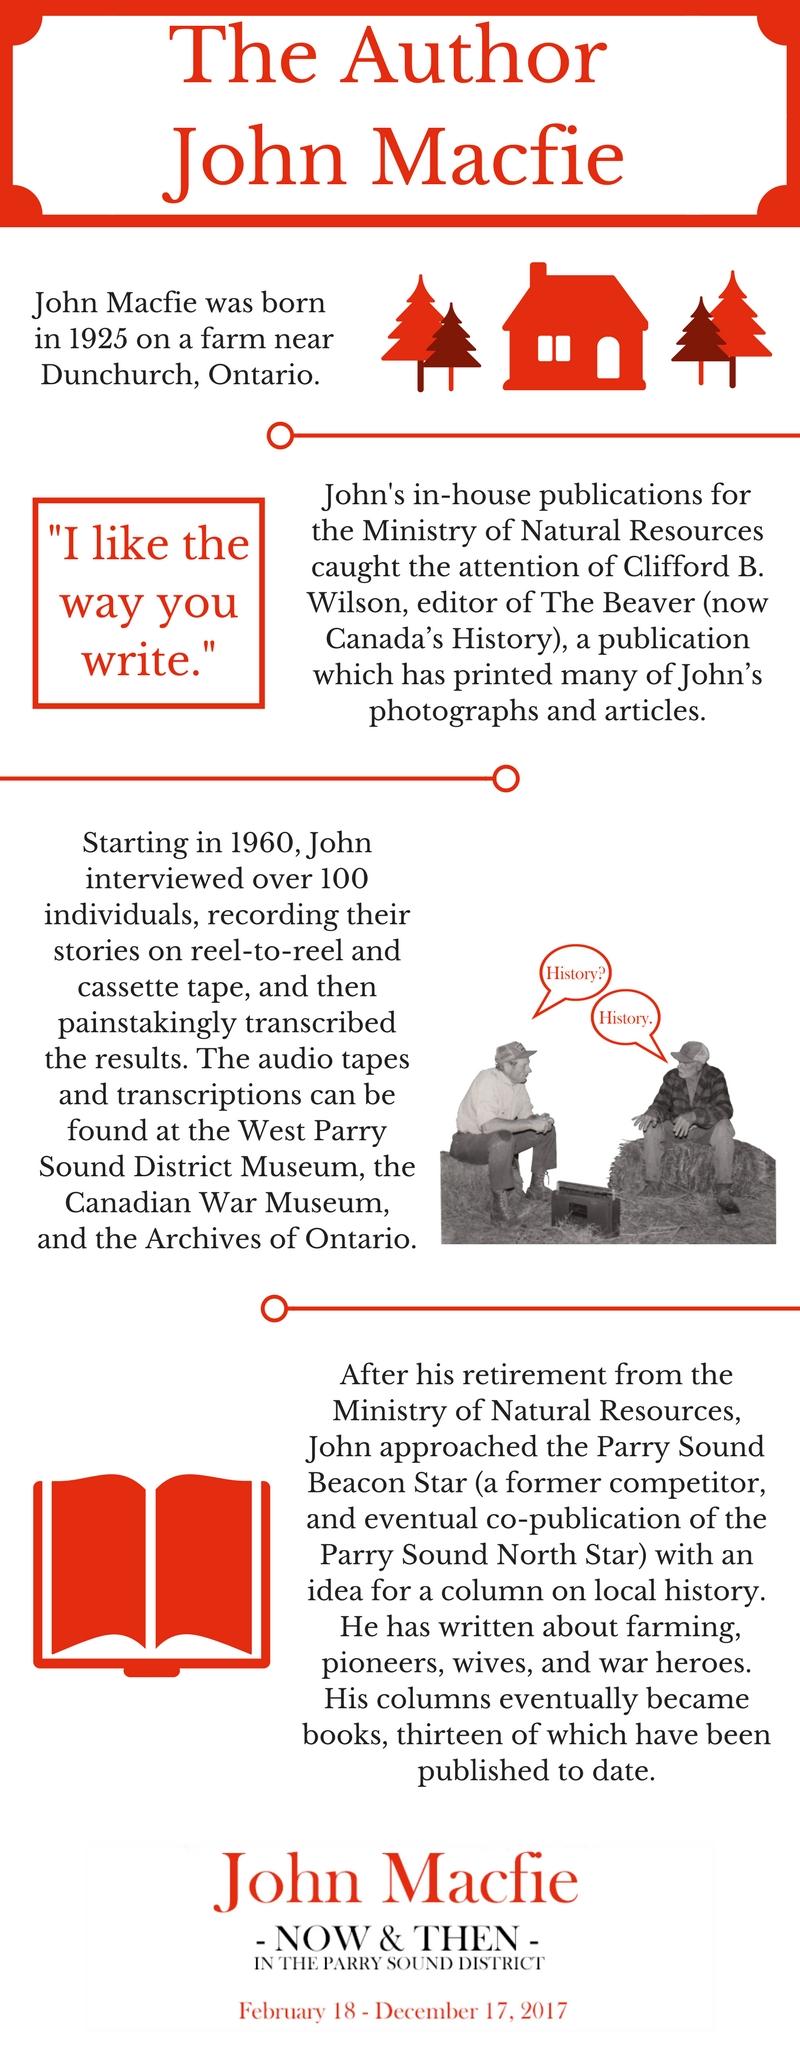 John Macfie Infographic.jpg